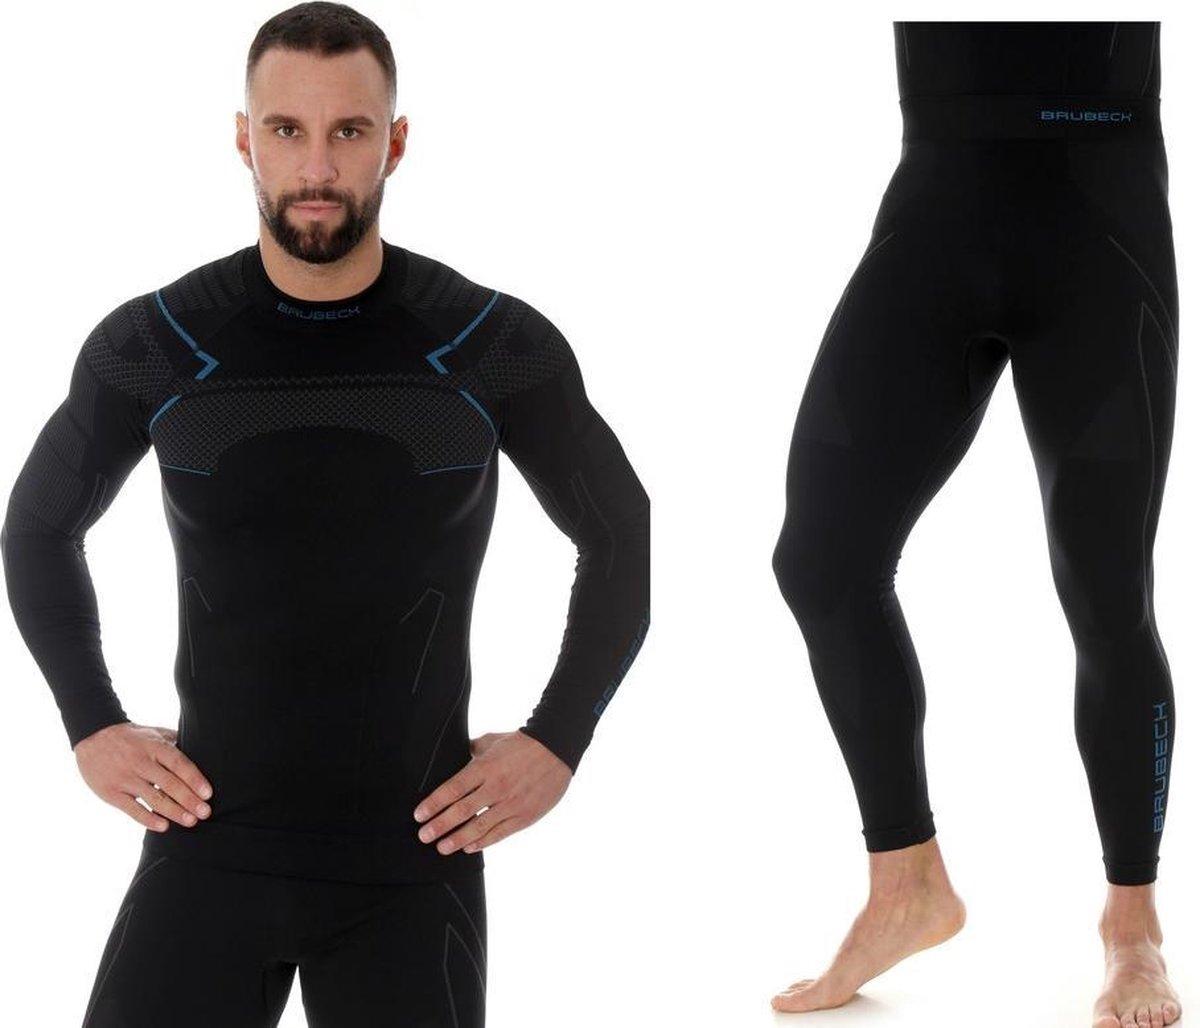 Brubeck Heren Thermokleding Set - met Nilit® Heat - Zwart/Blauw - S